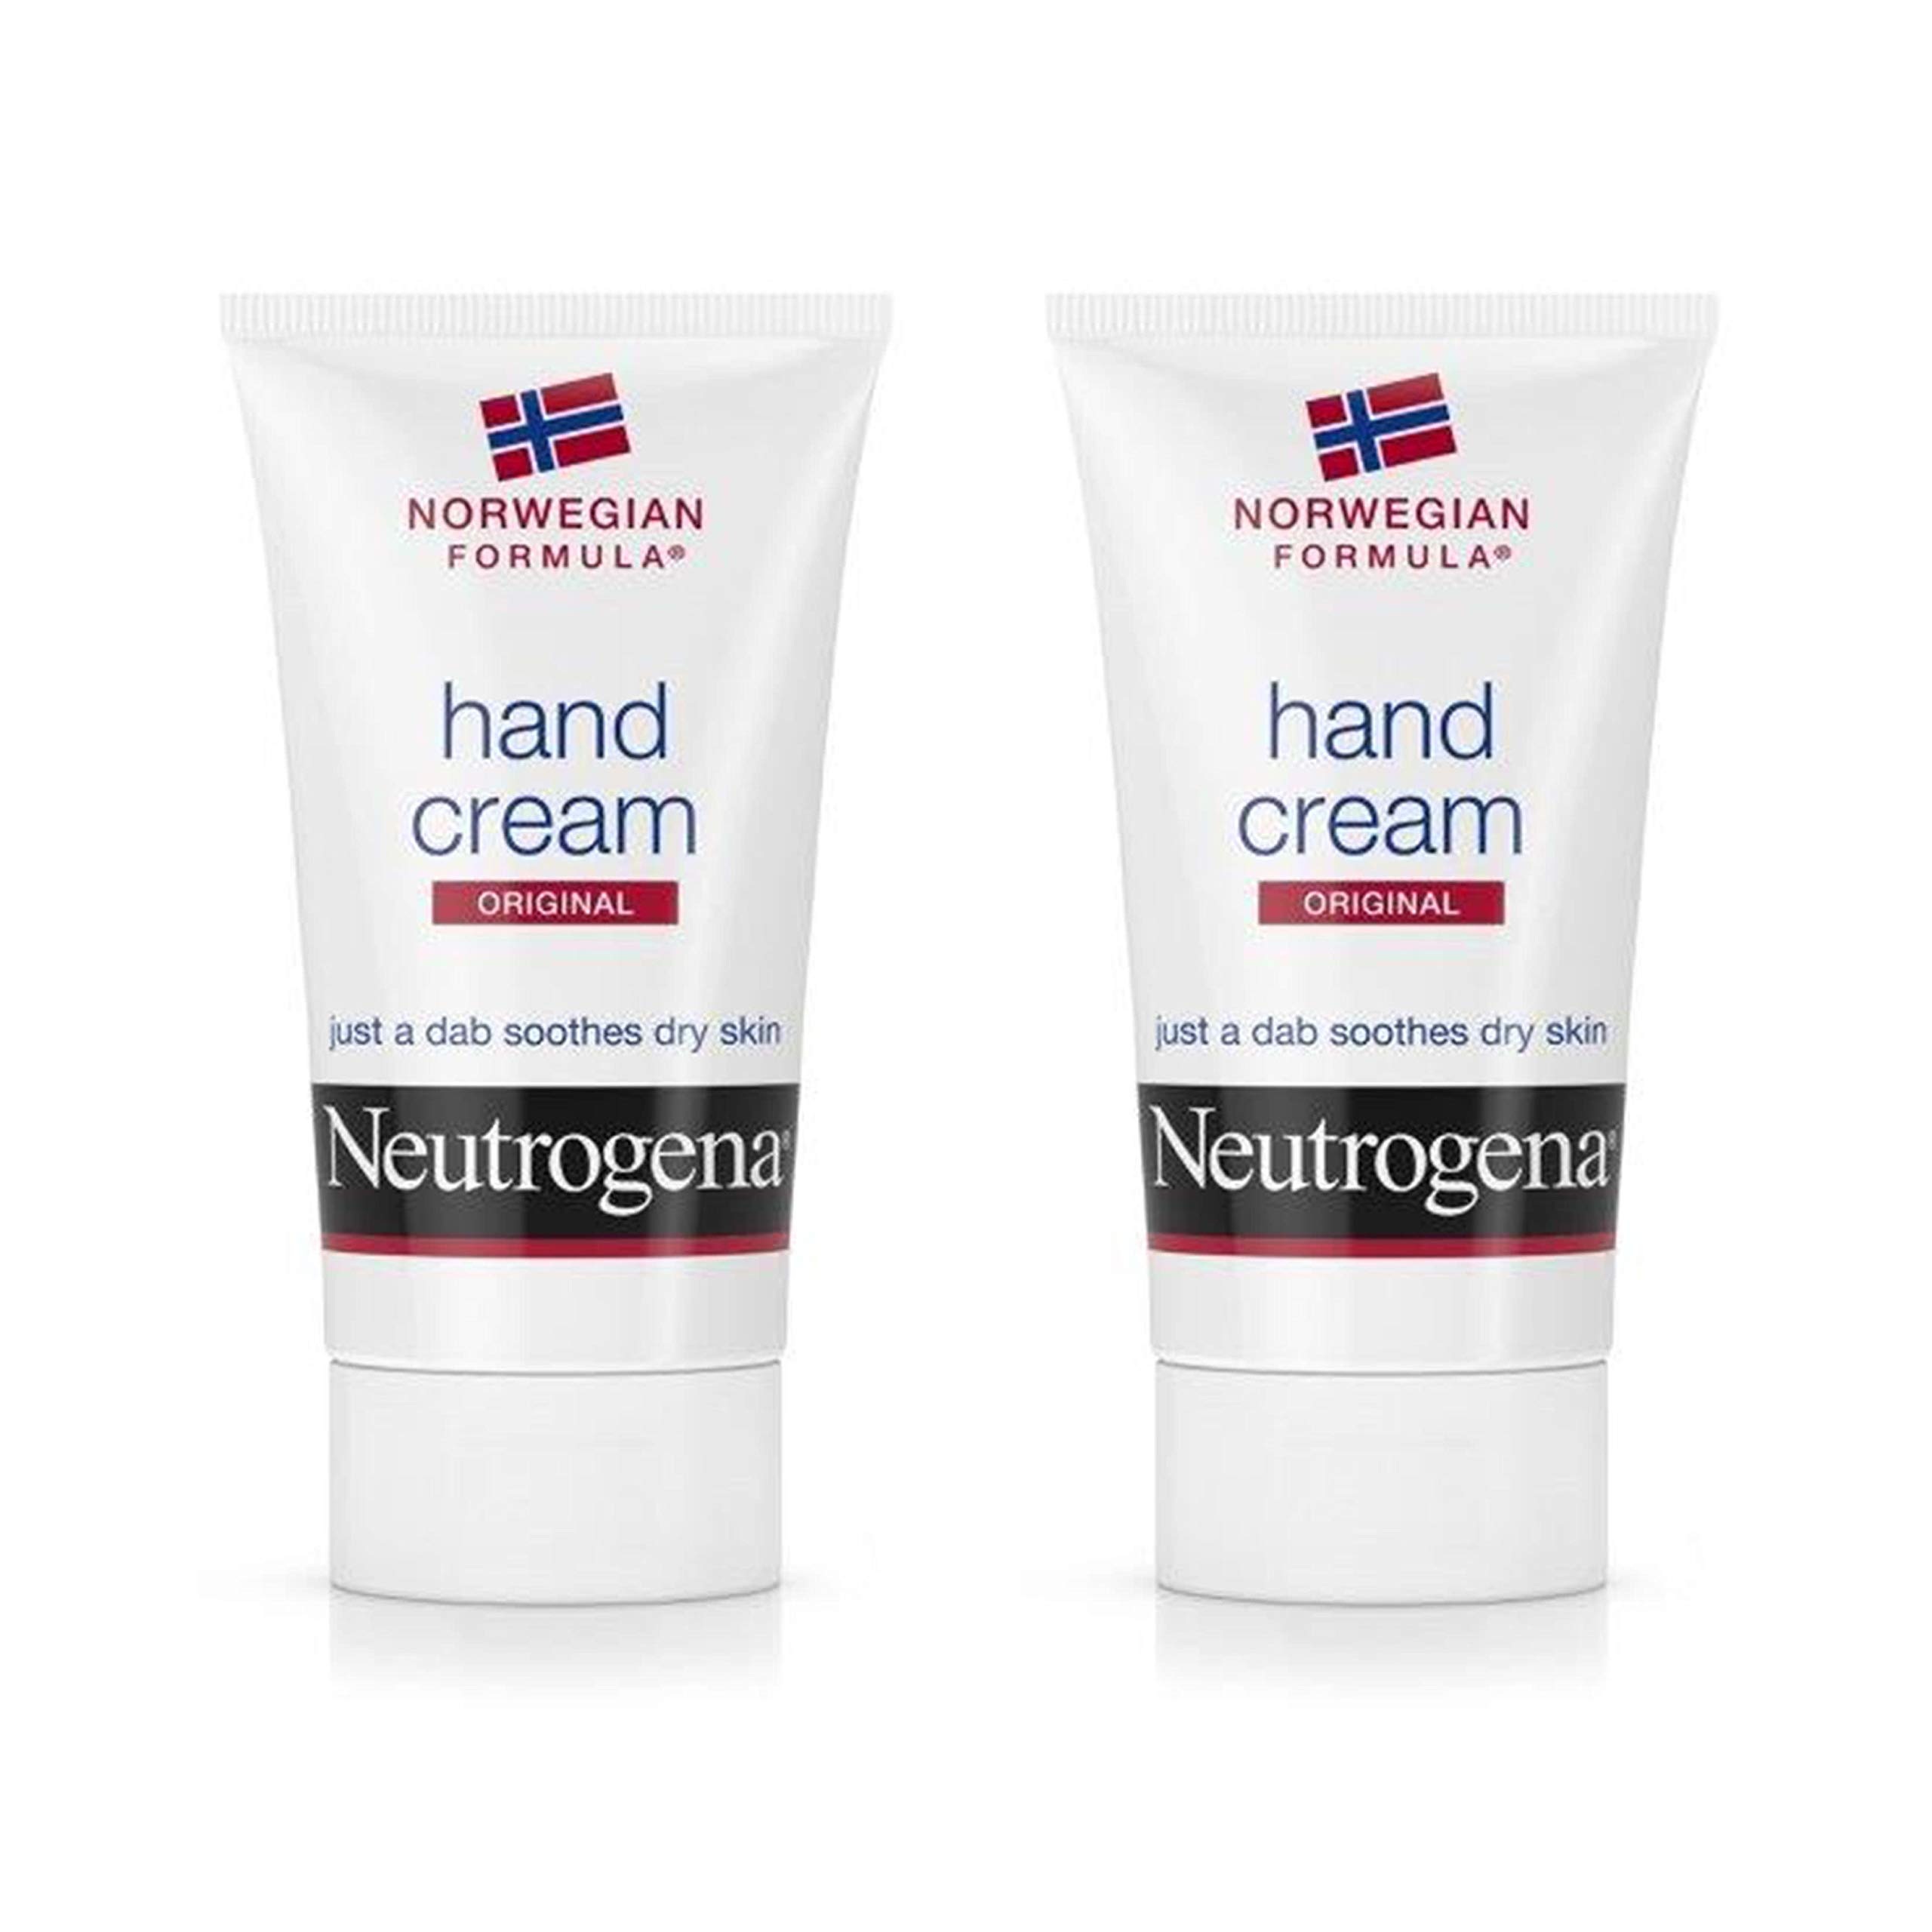 Neutrogena Norwegian Formula Hand Cream, 2 Oz (Pack of 2) by Neutrogena